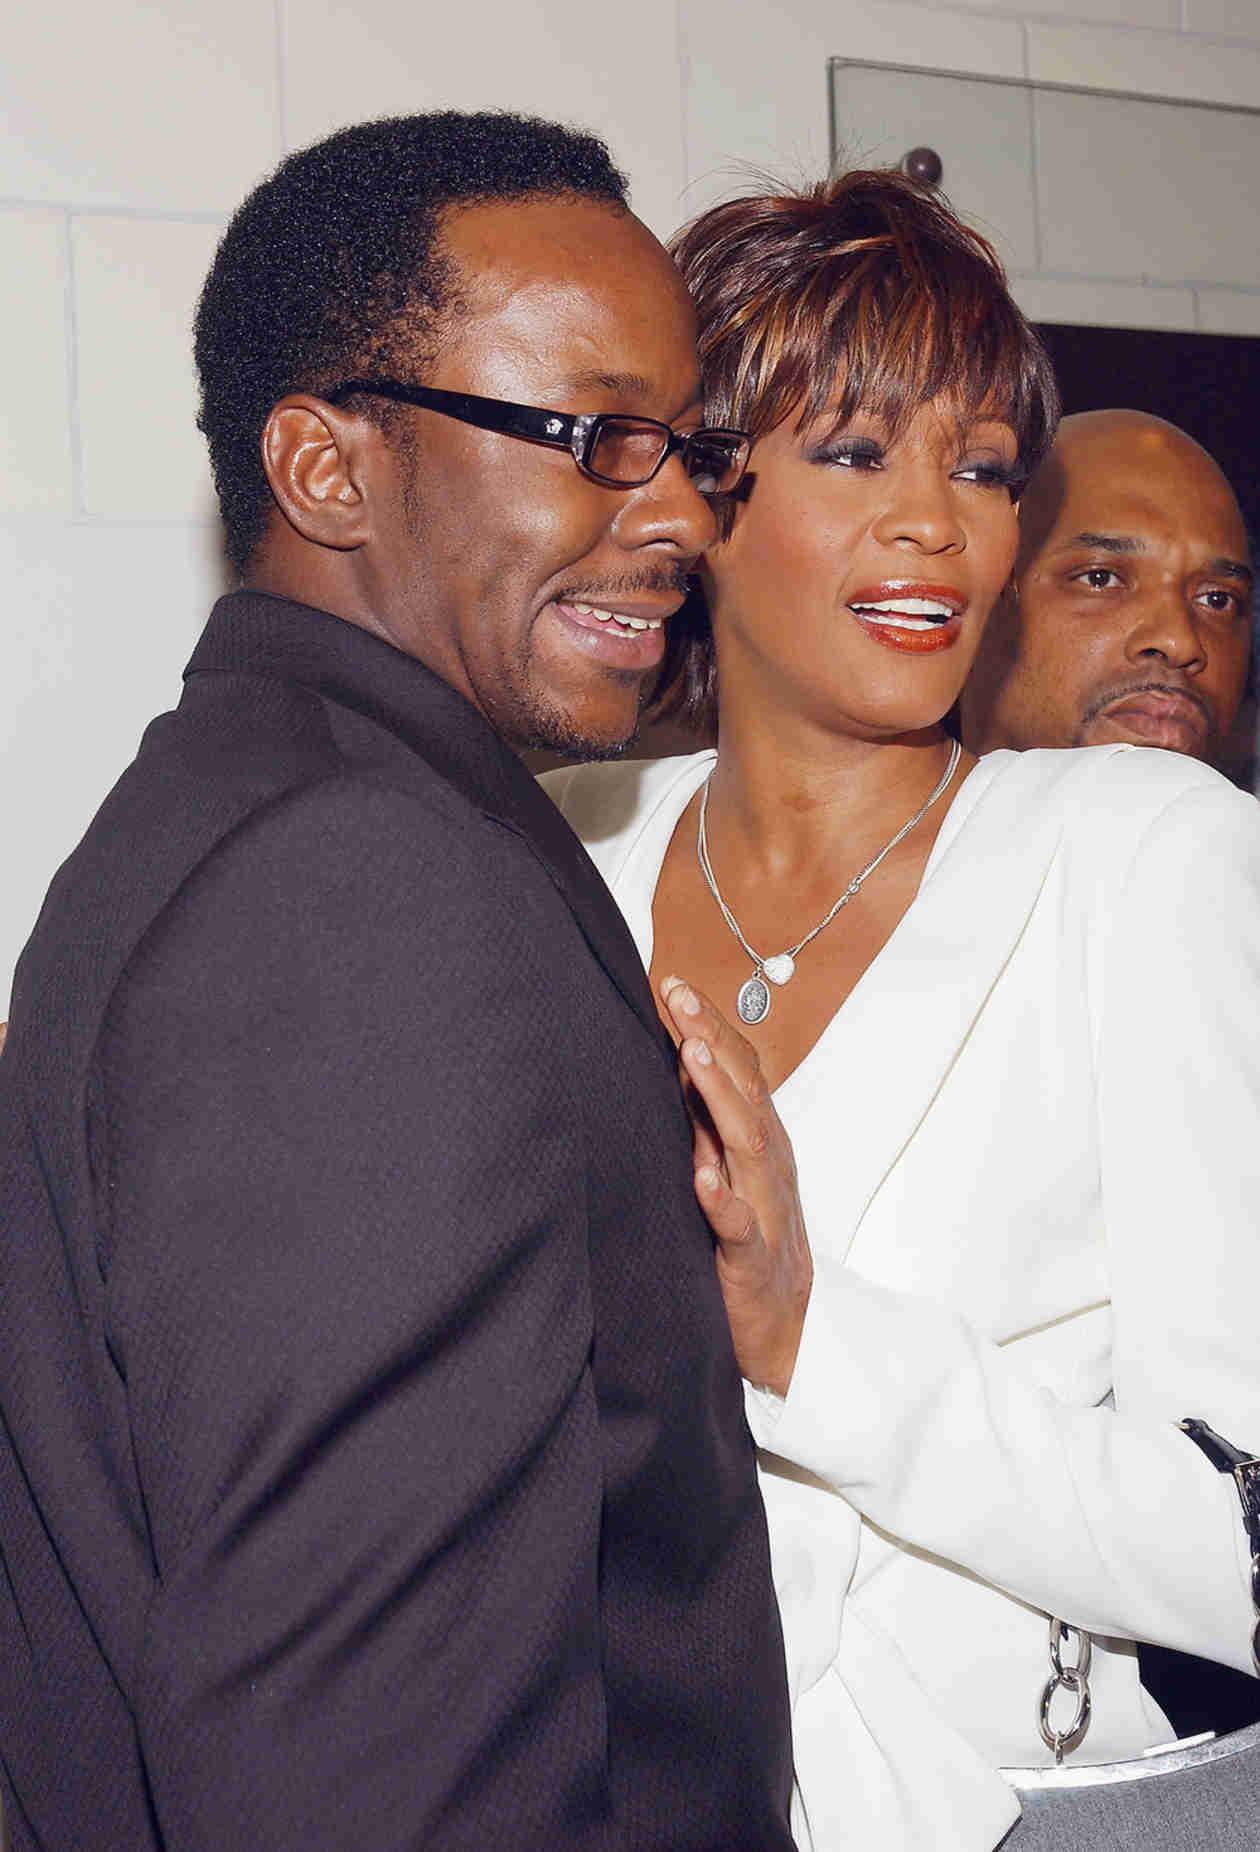 Yaya DaCosta and Arlen Escarpeta as Whitney Houston and Bobby Brown Together! (PHOTO)